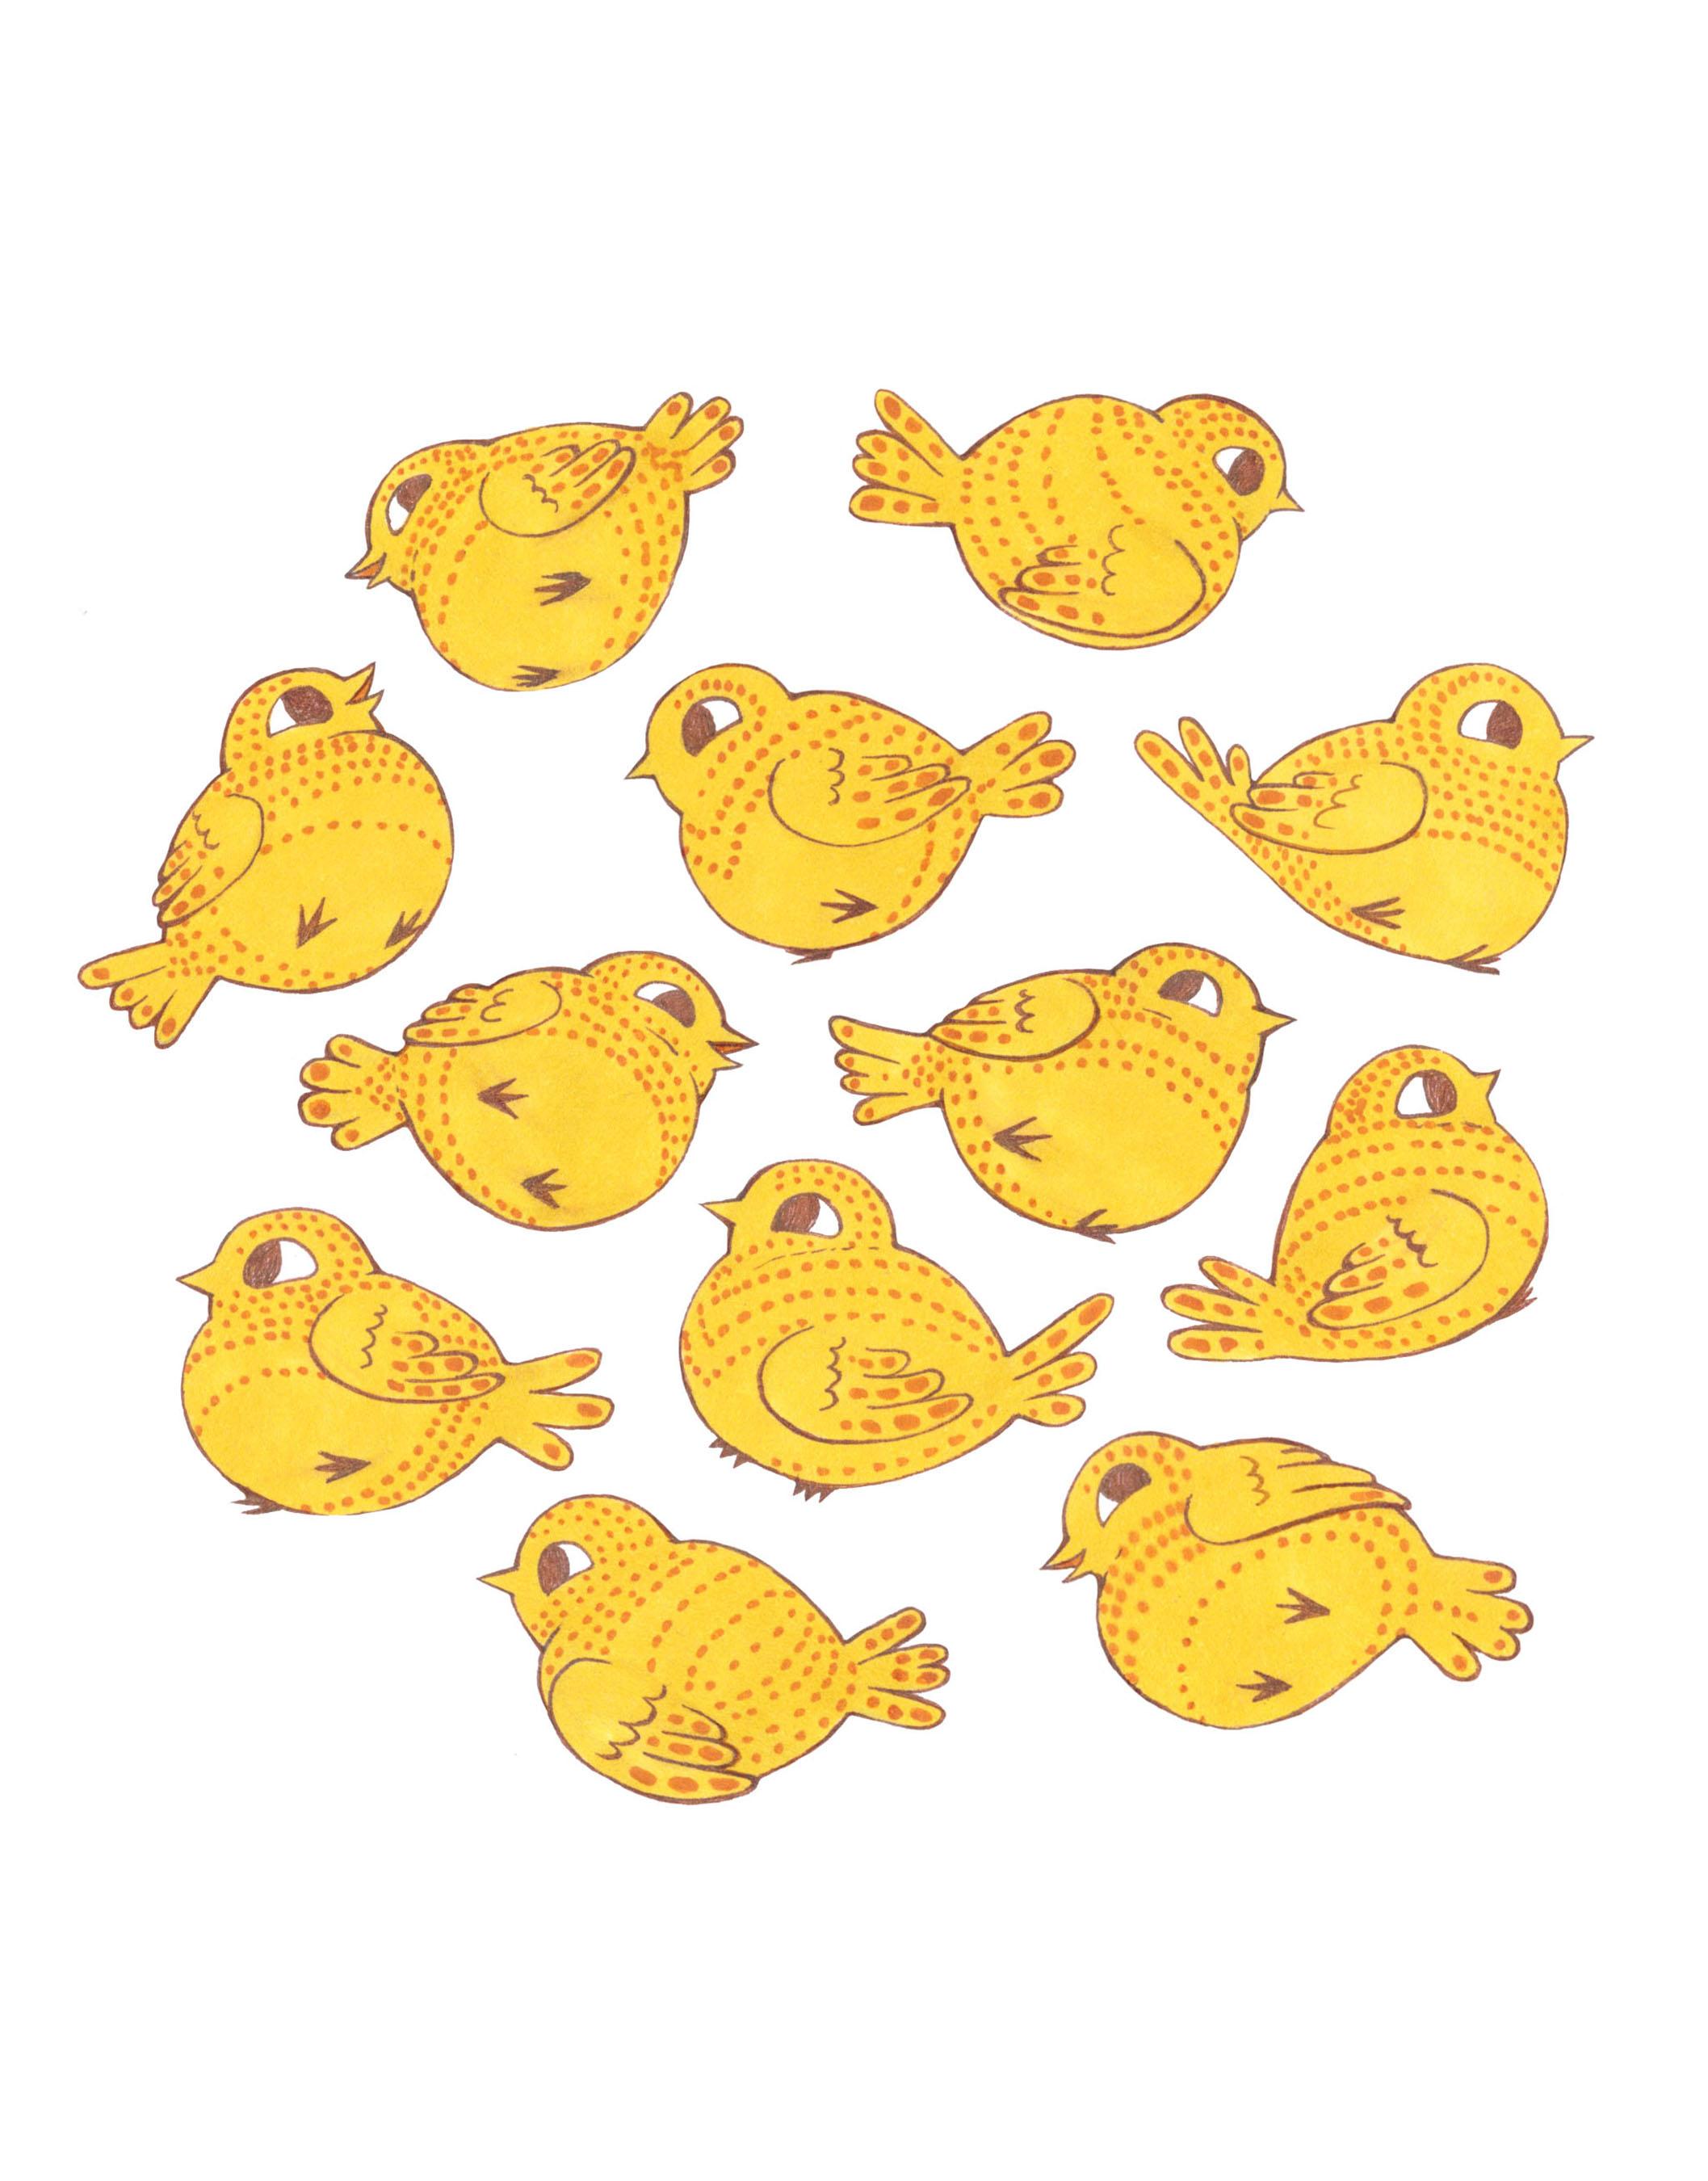 goldenchubstickers.jpg